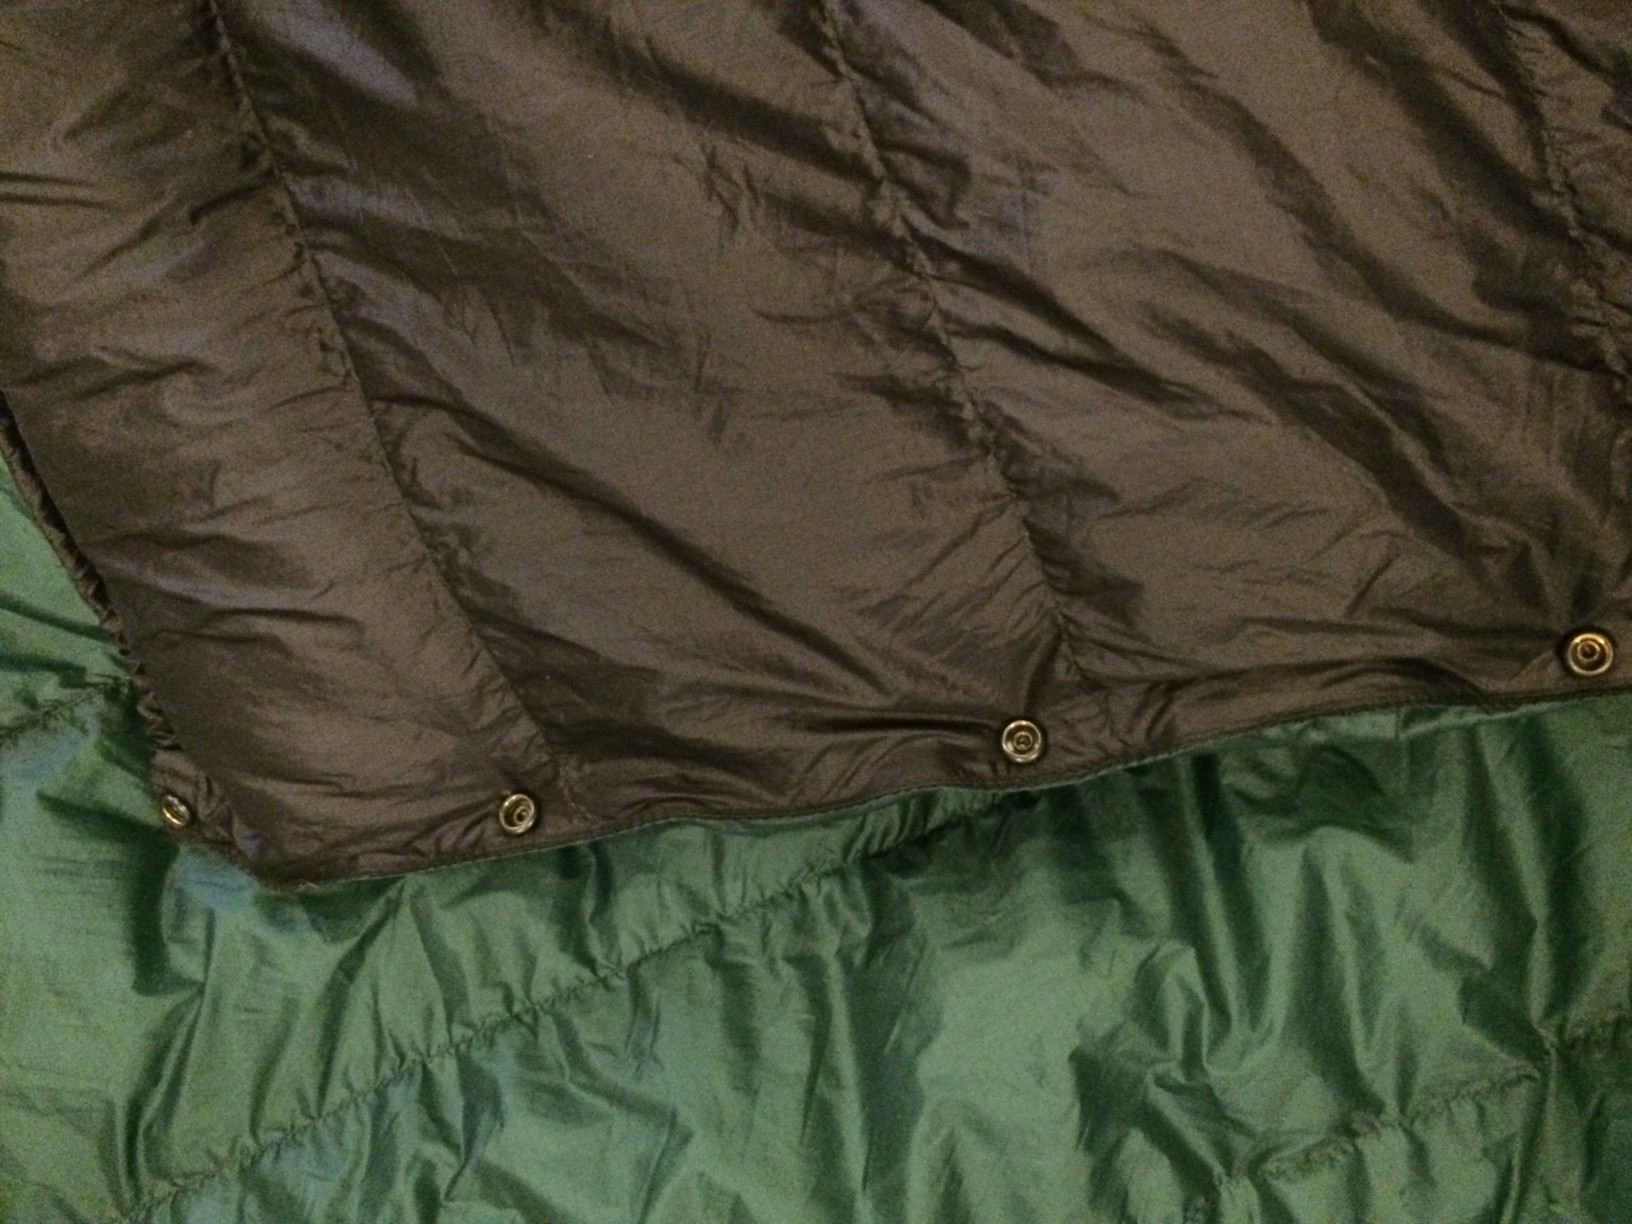 fs hammock gear burrow 30 deg backpacking light On hammock gear burrow